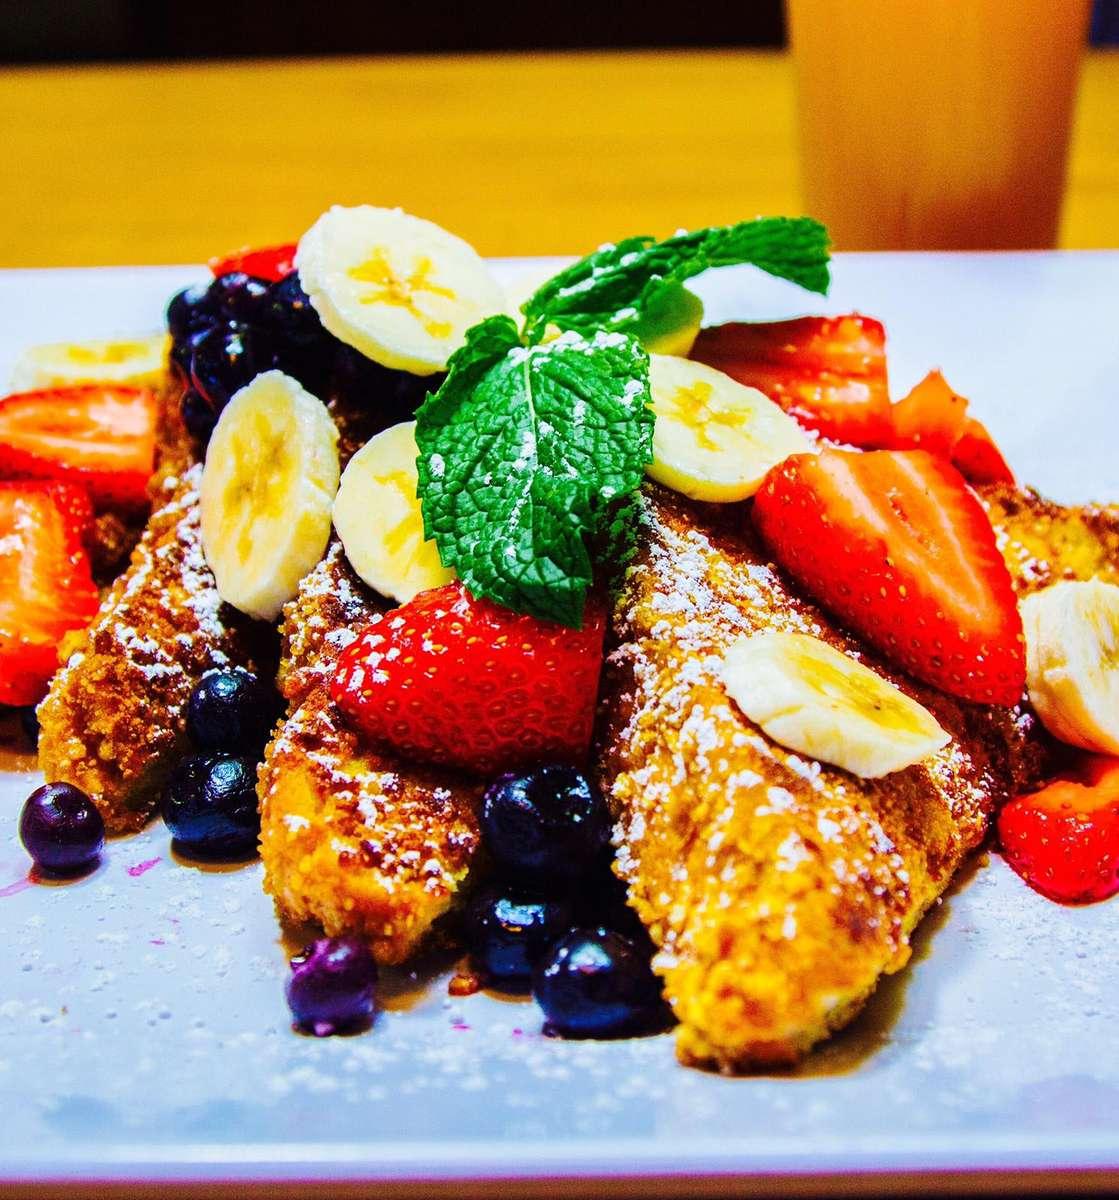 Wild Blueberry, Banana & Strawberry